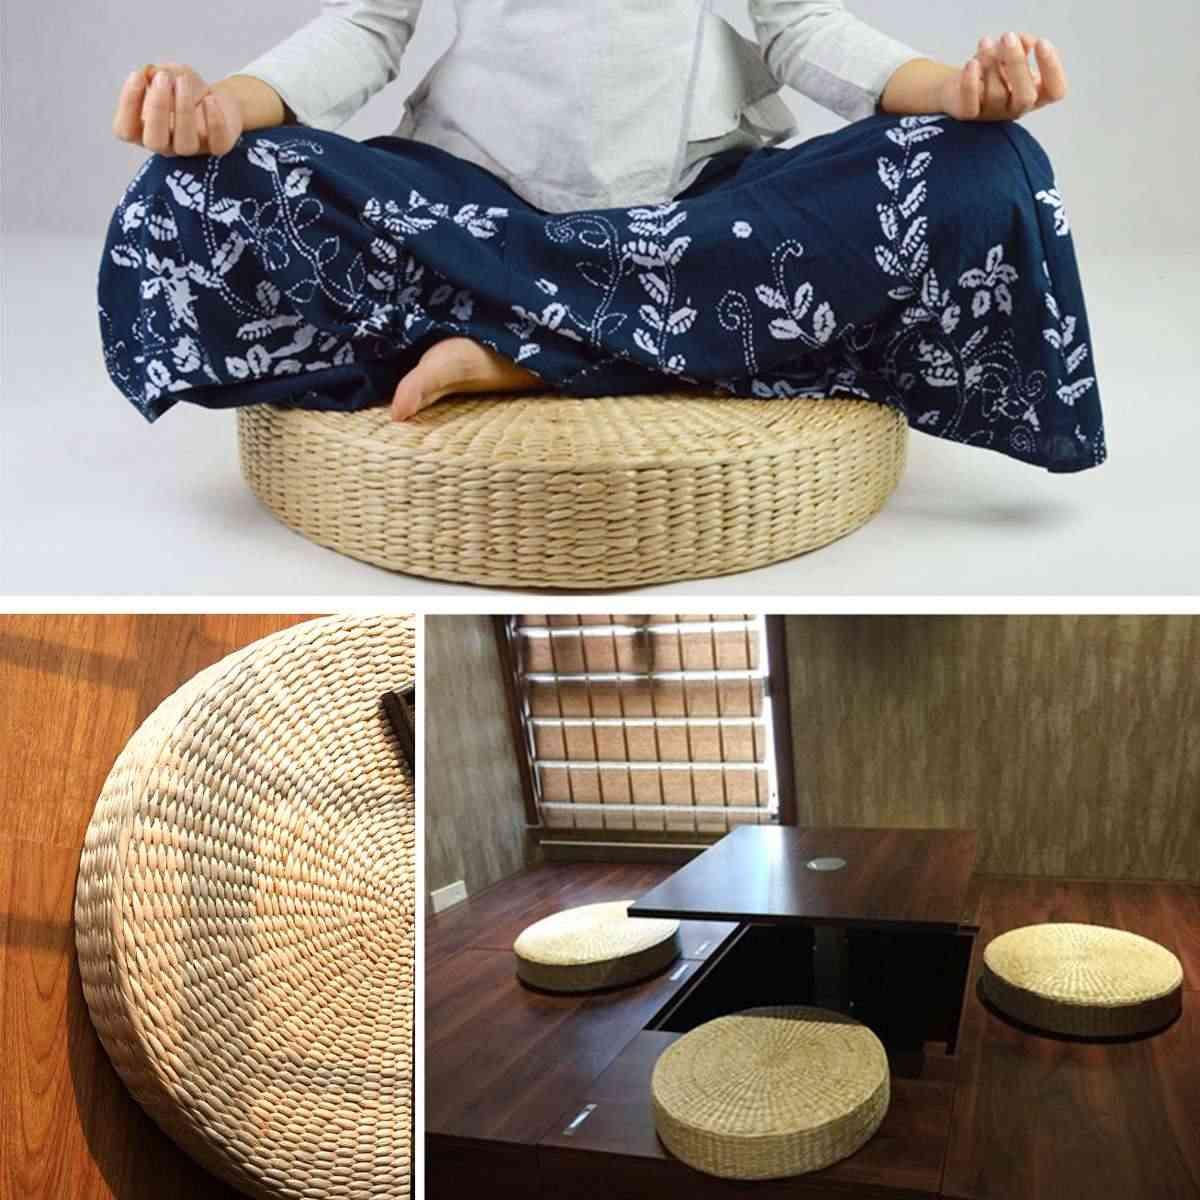 40x7.5 cm 자연 짚 직조 라운드 pouf 다다미 쿠션 바닥 쿠션 명상 요가 라운드 매트 홈 침실 의자 쿠션